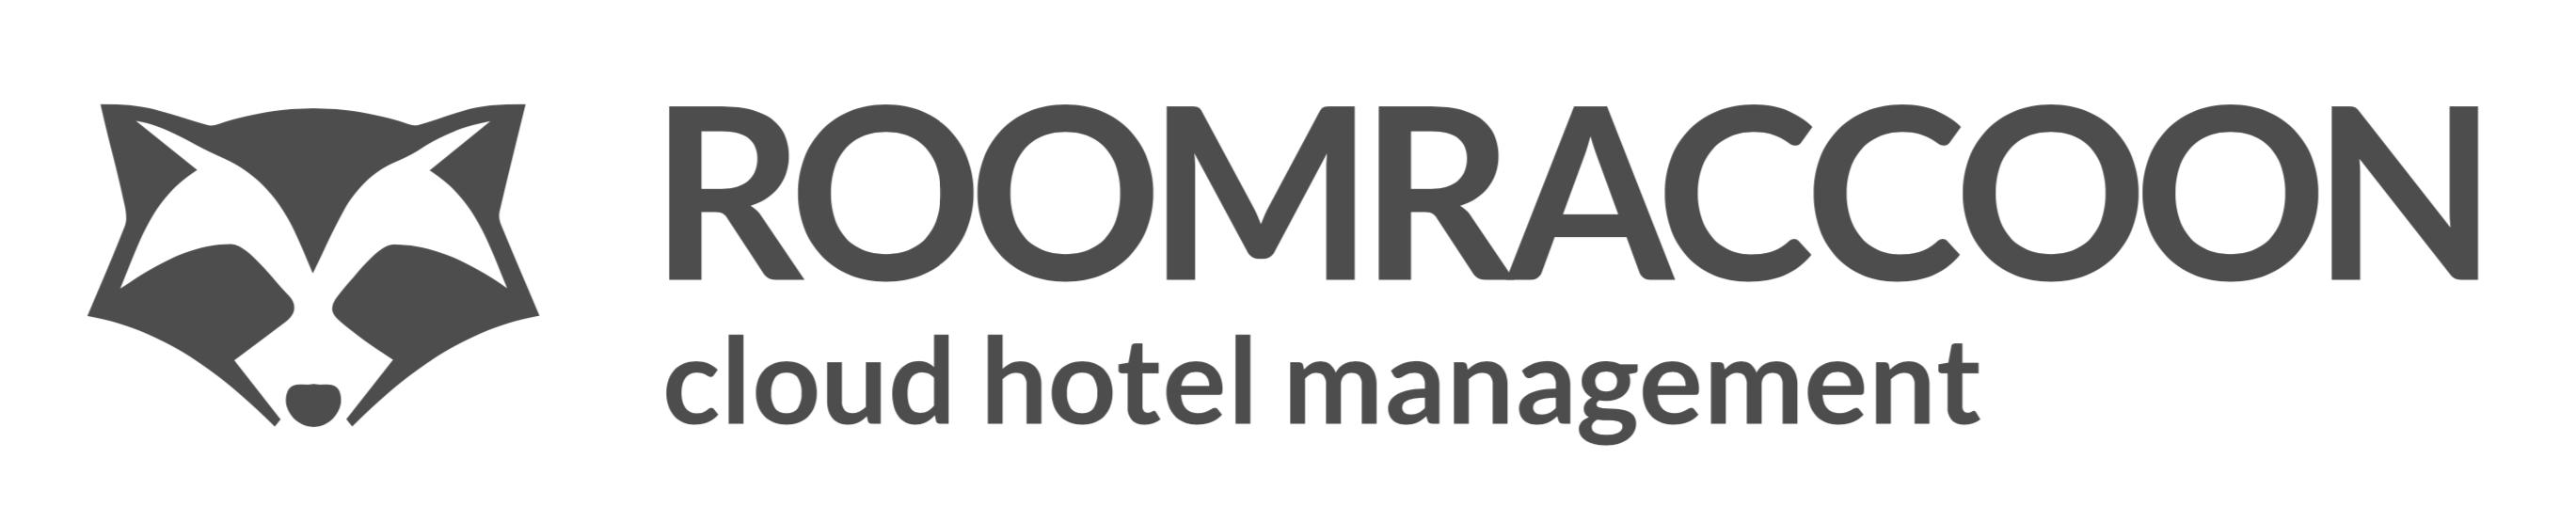 RoomRaccoon Cloud Hotel Management